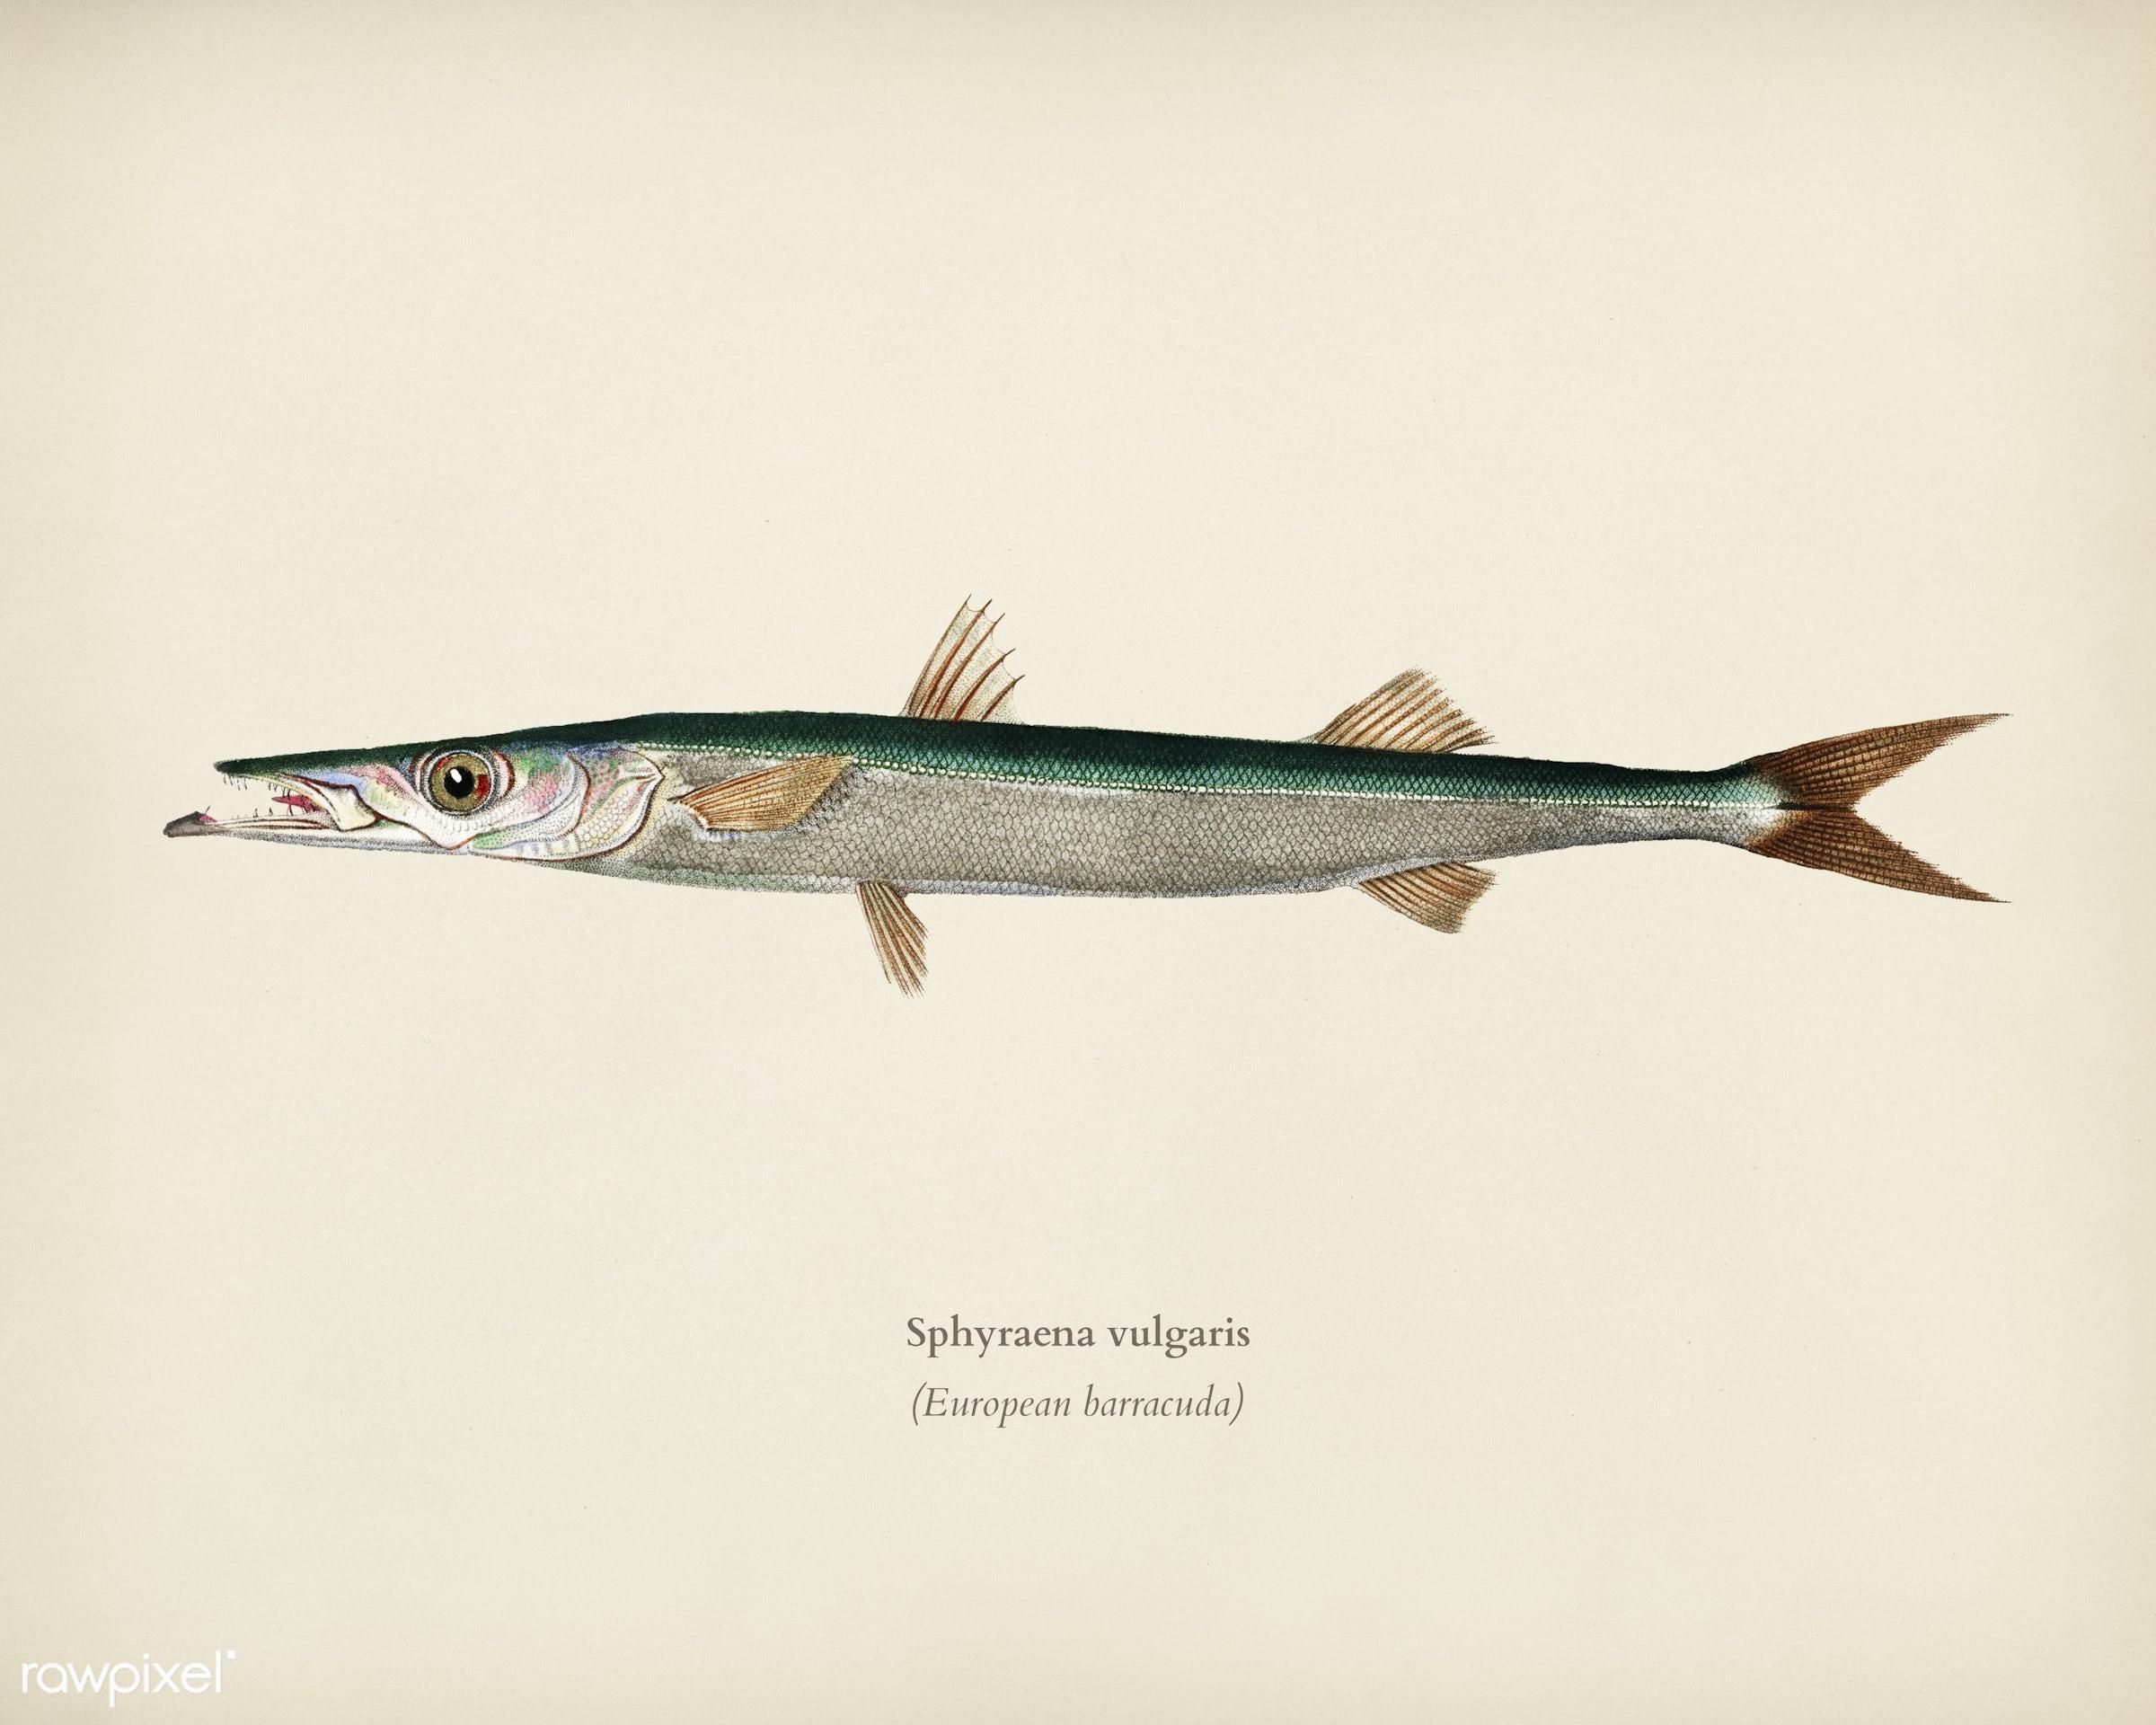 Sphyraena vulgaris illustrated by Charles Dessalines D' Orbigny (1806-1876). Digitally enhanced from our own 1892...